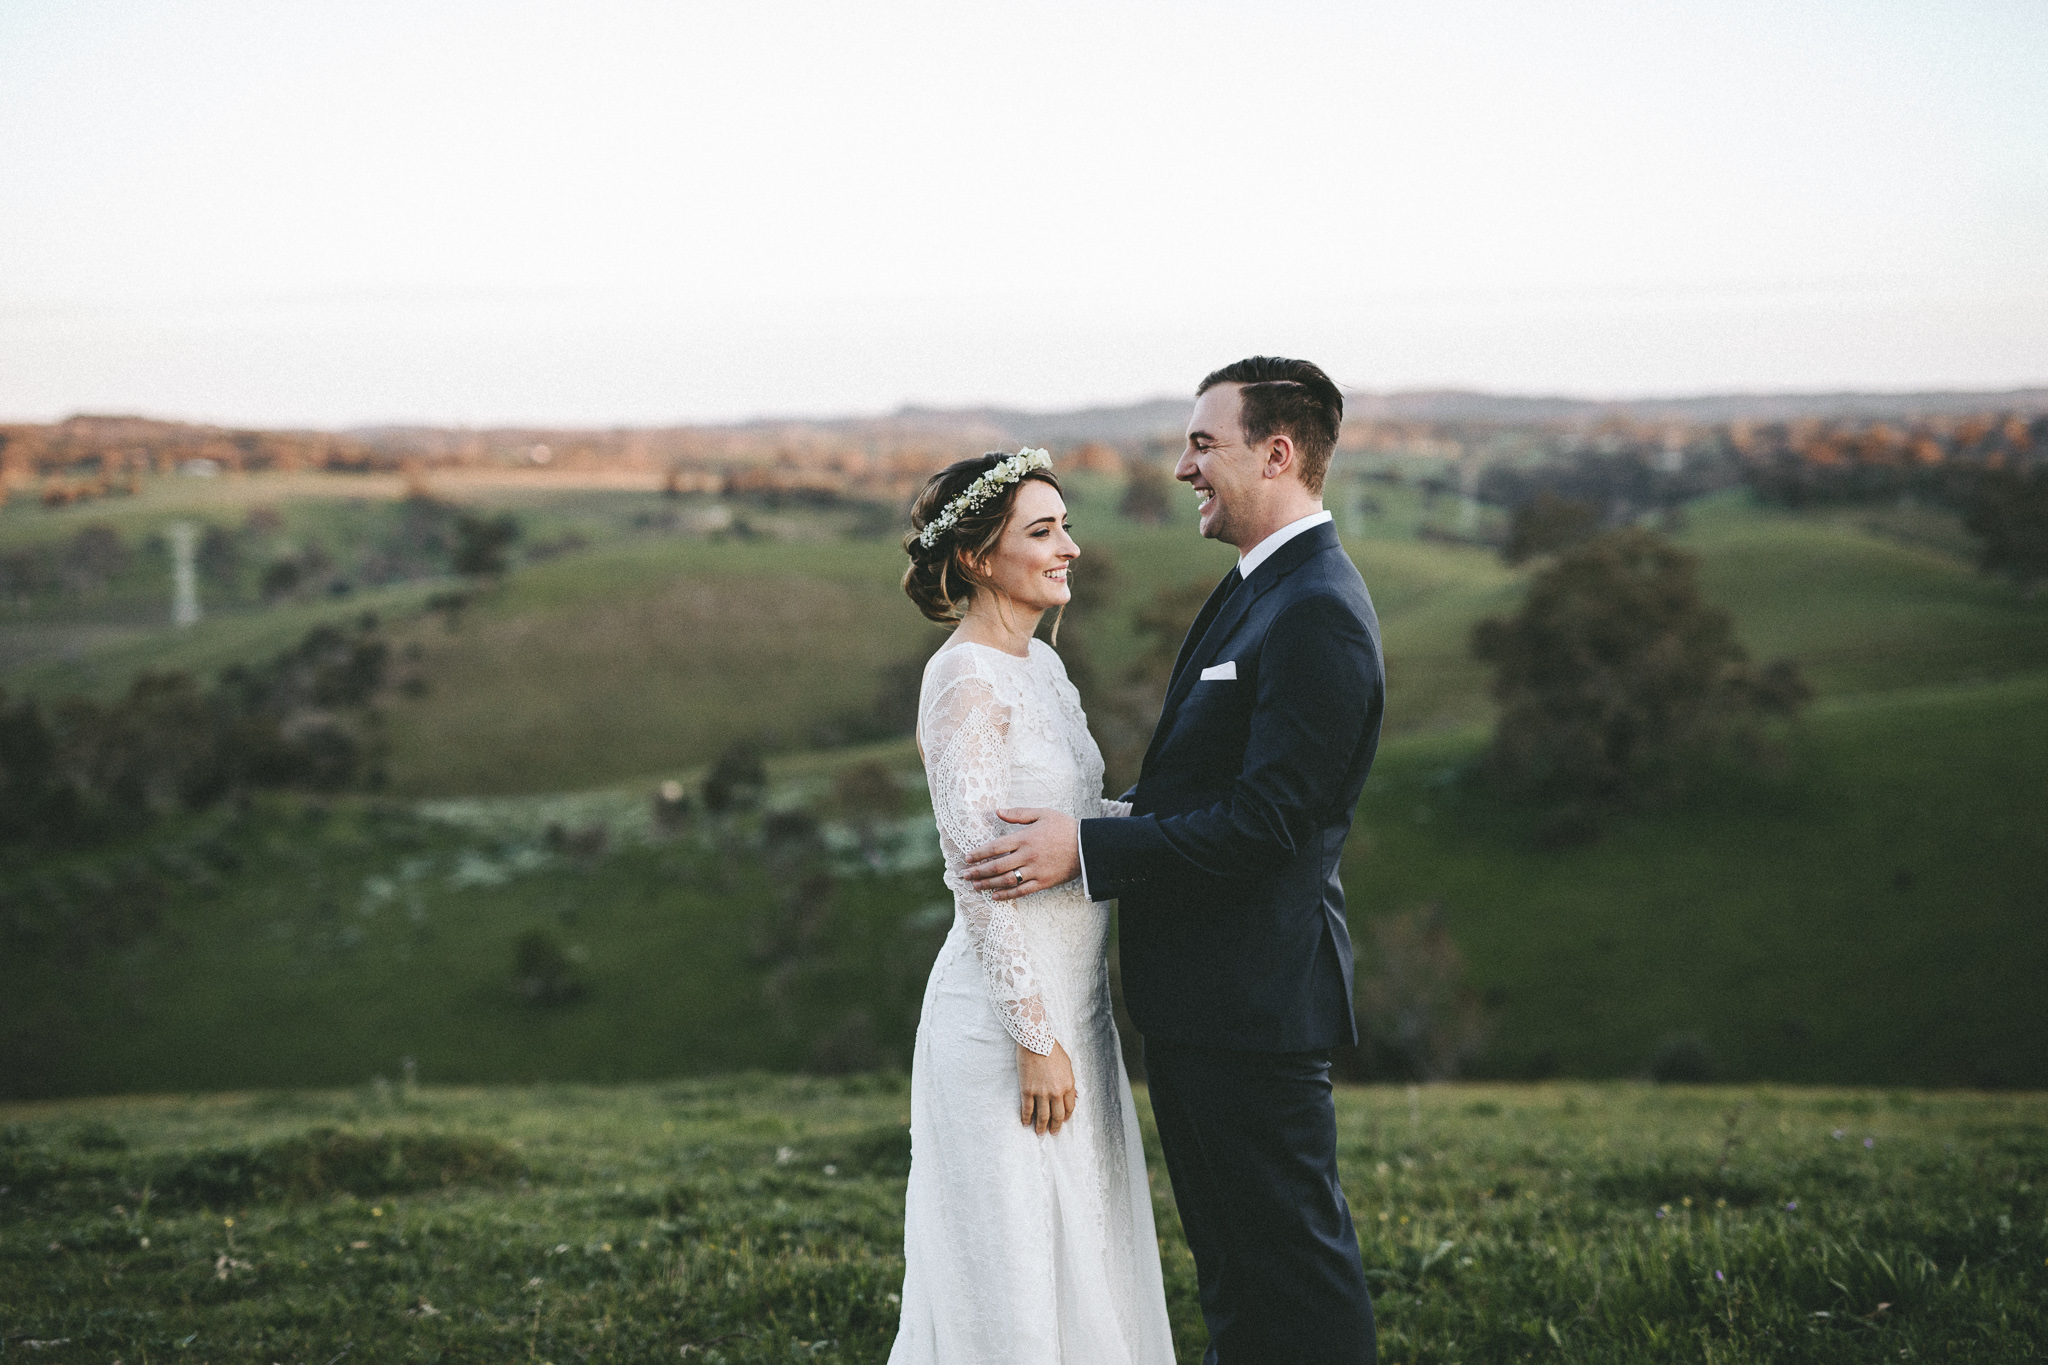 christopher morrison_adelaide hills wedding_ andy + teegan_90_1104.jpg